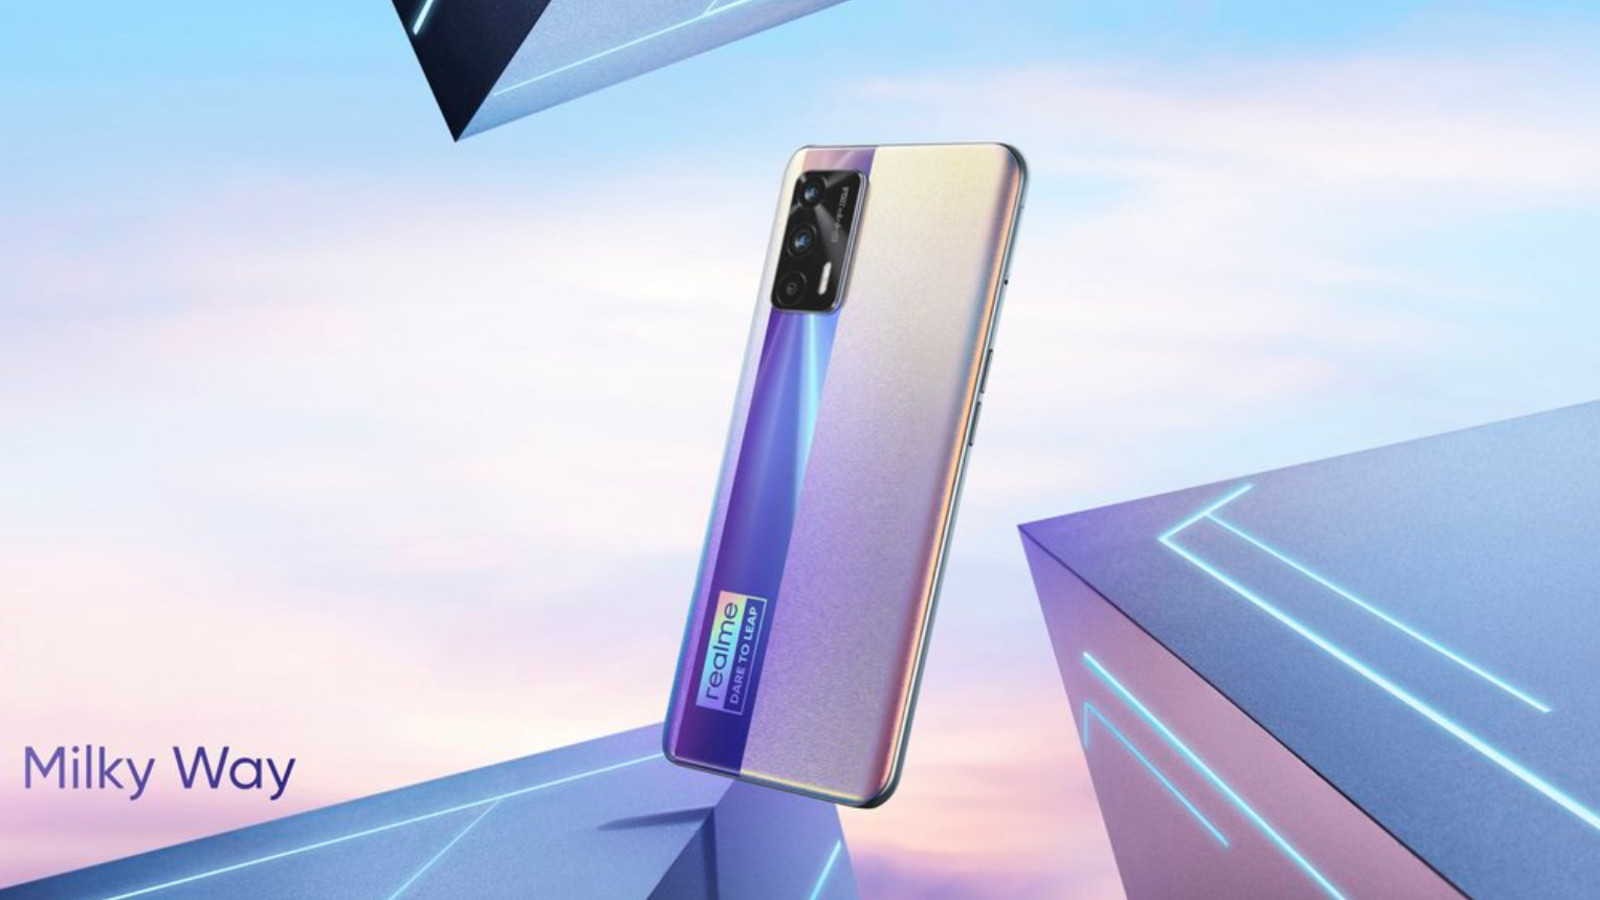 Realme X7 Max Reviews, Realme X7 Max the Best Camera Picture Realme X7 Max Screen Guide, Realme X7 Max testing, Realme X7 Max replacement